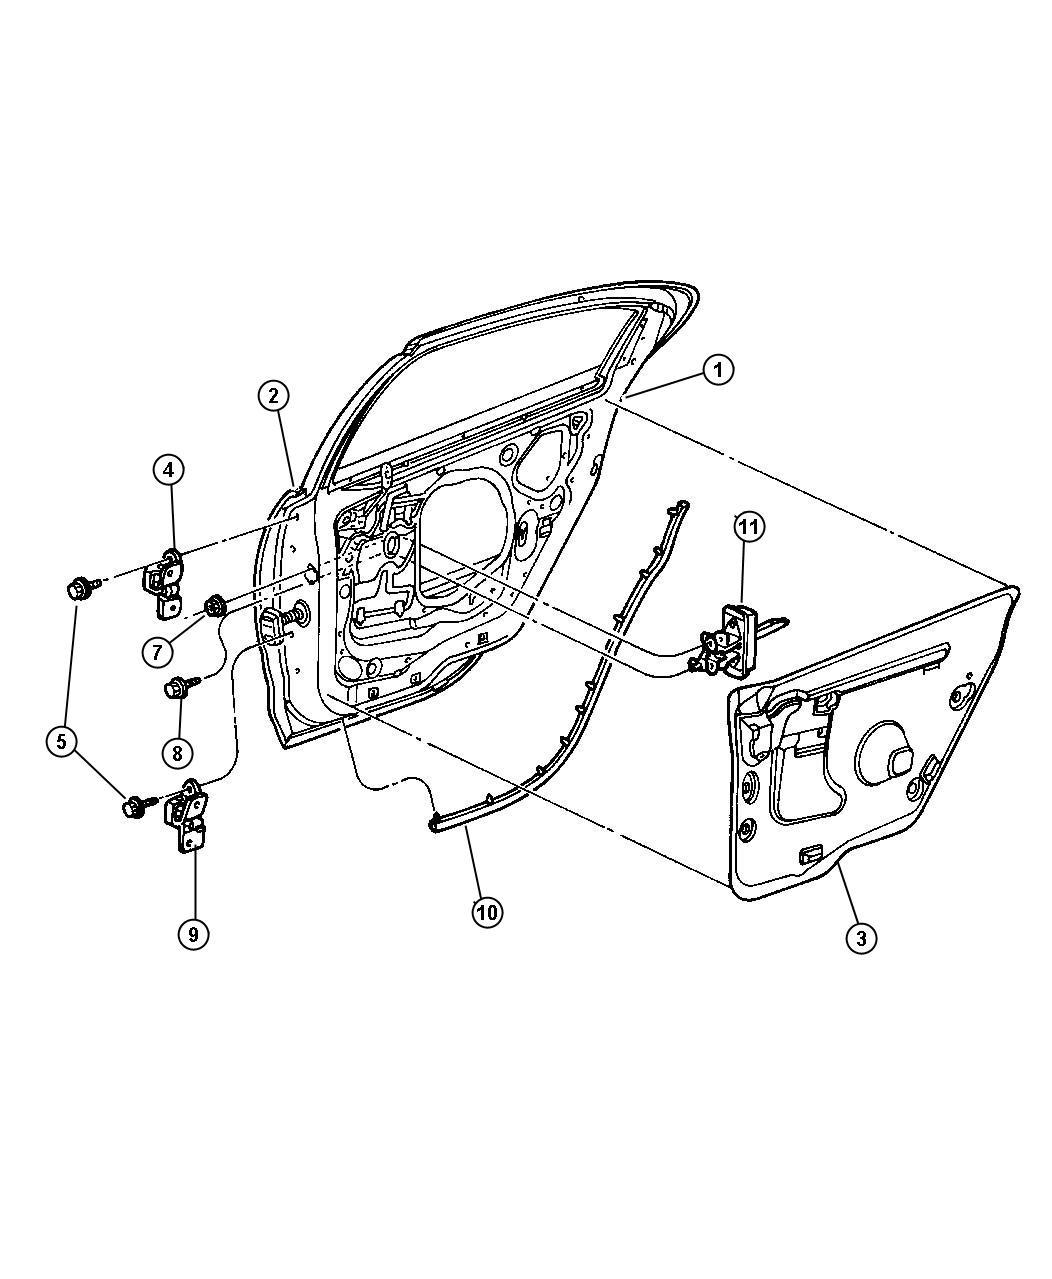 2001 Dodge Intrepid Seal. B-pillar. Check strap